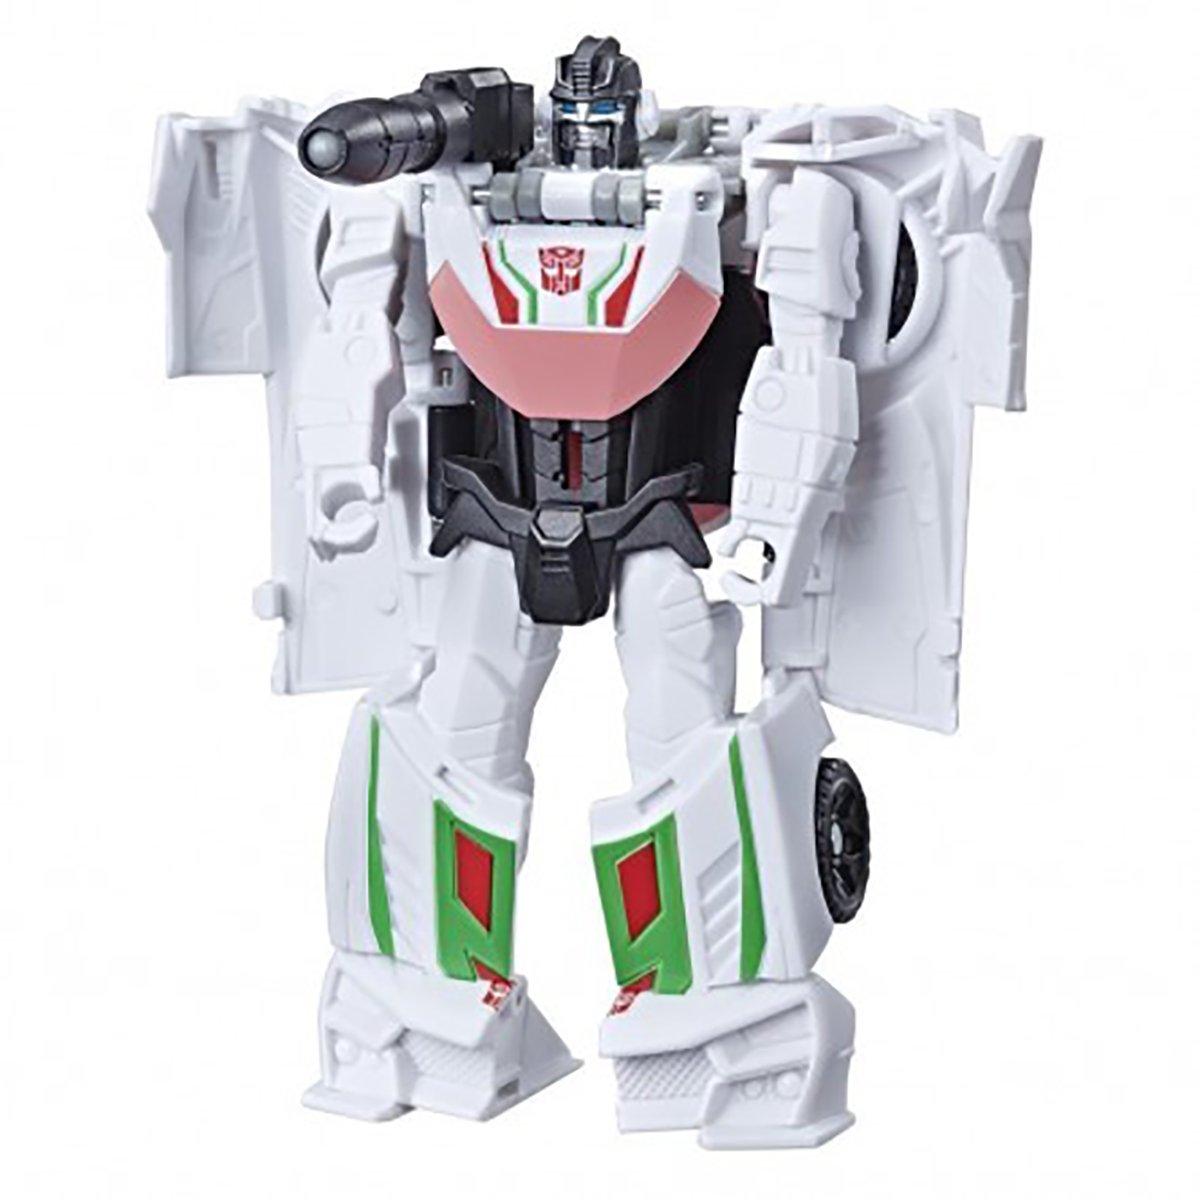 Figurina Transformers Cyberverse, Wheeljack E3646